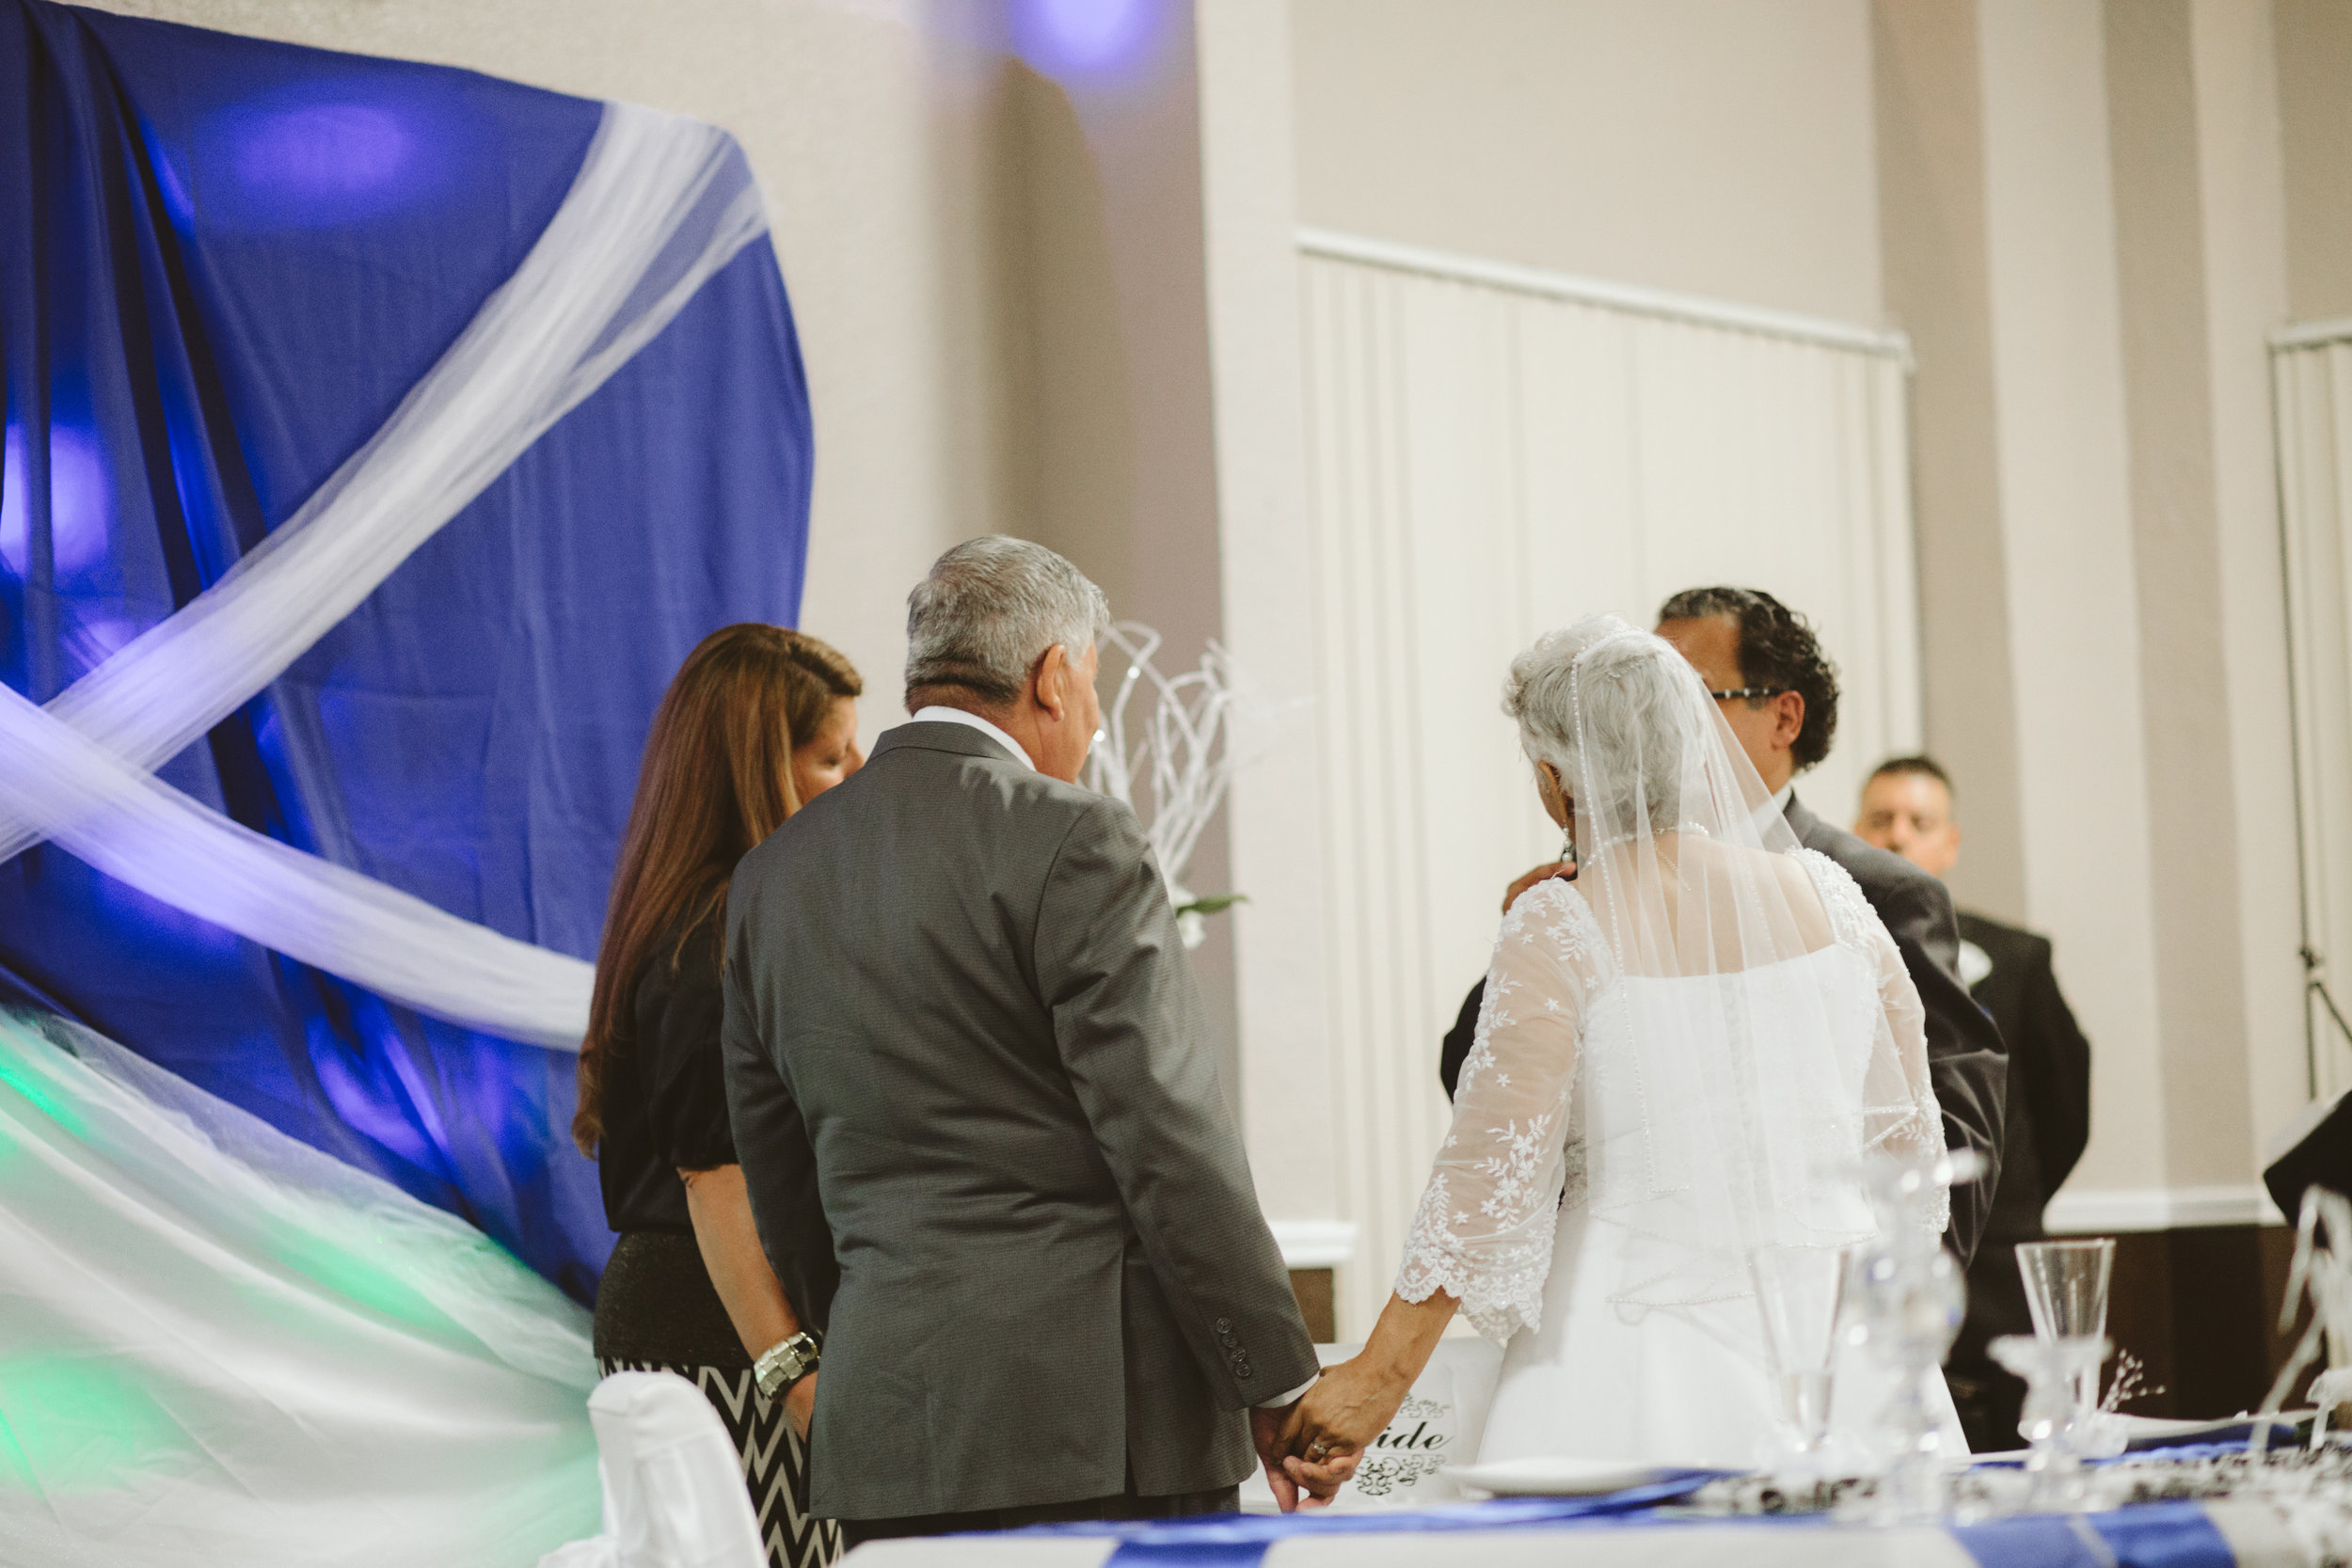 wedding | Vanessa Boy Photography | vanessaboy.com |-322.jpg